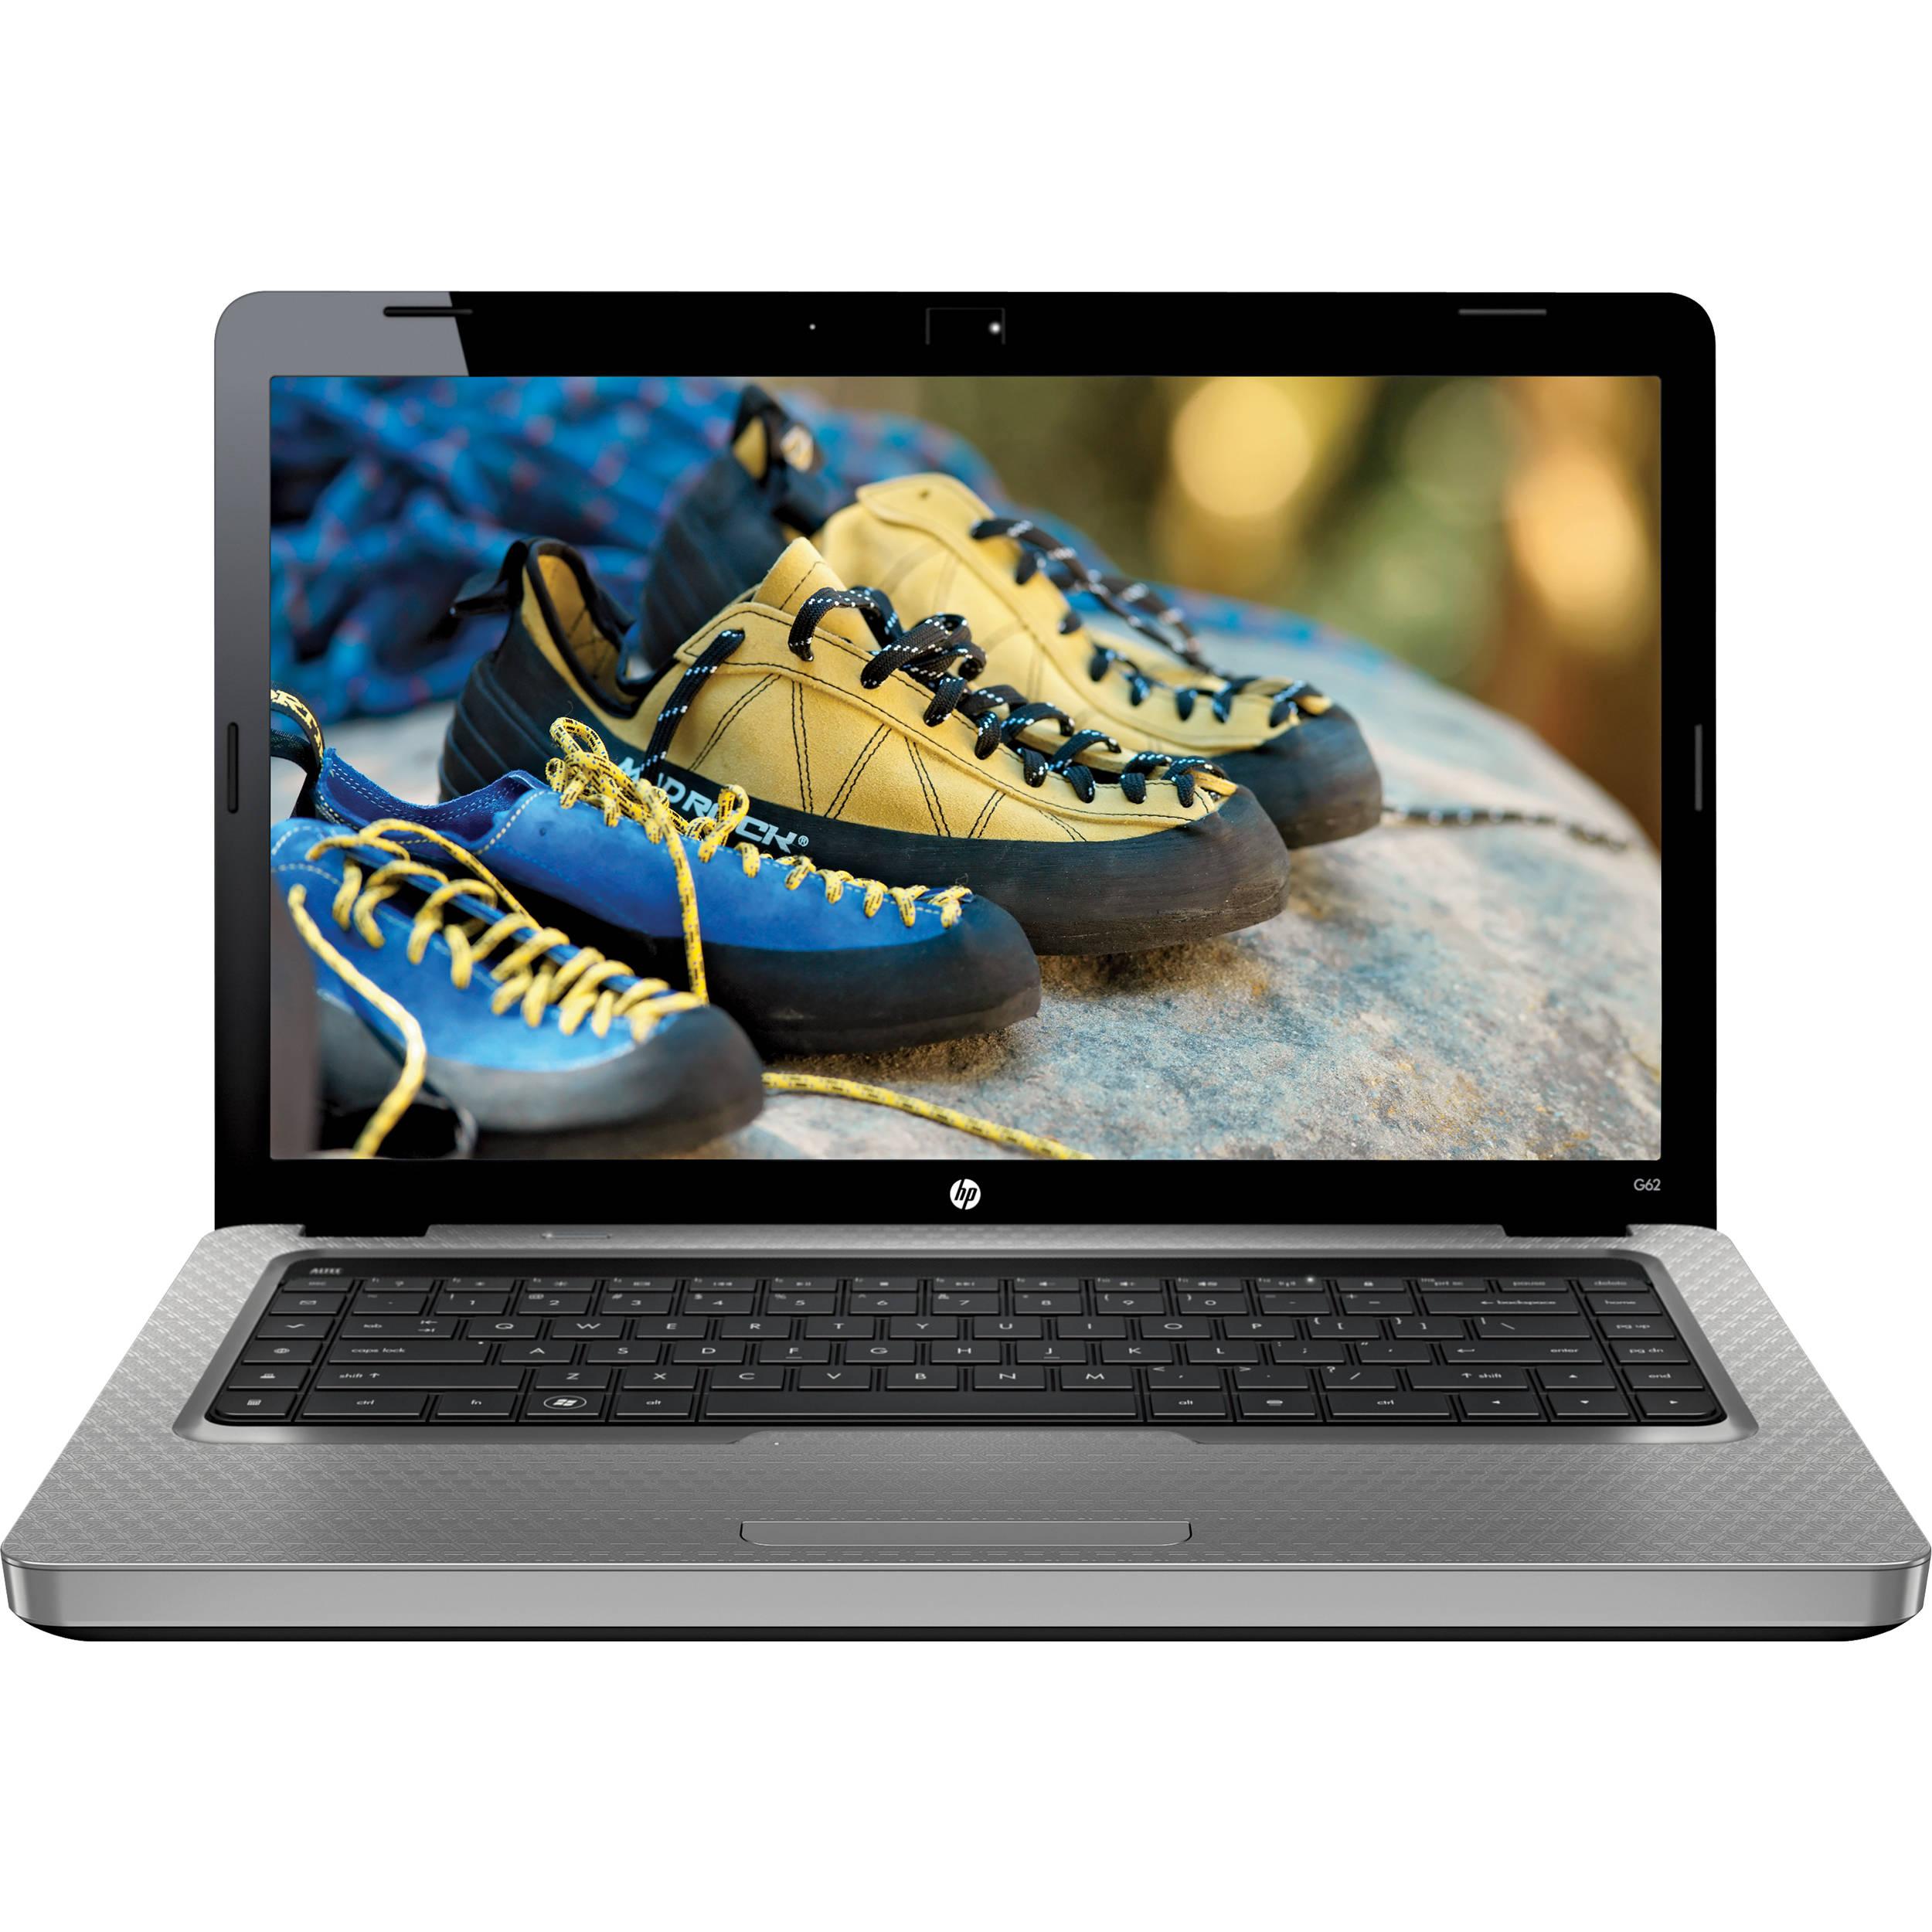 "HP G62-220US 15.6"" Notebook Computer"